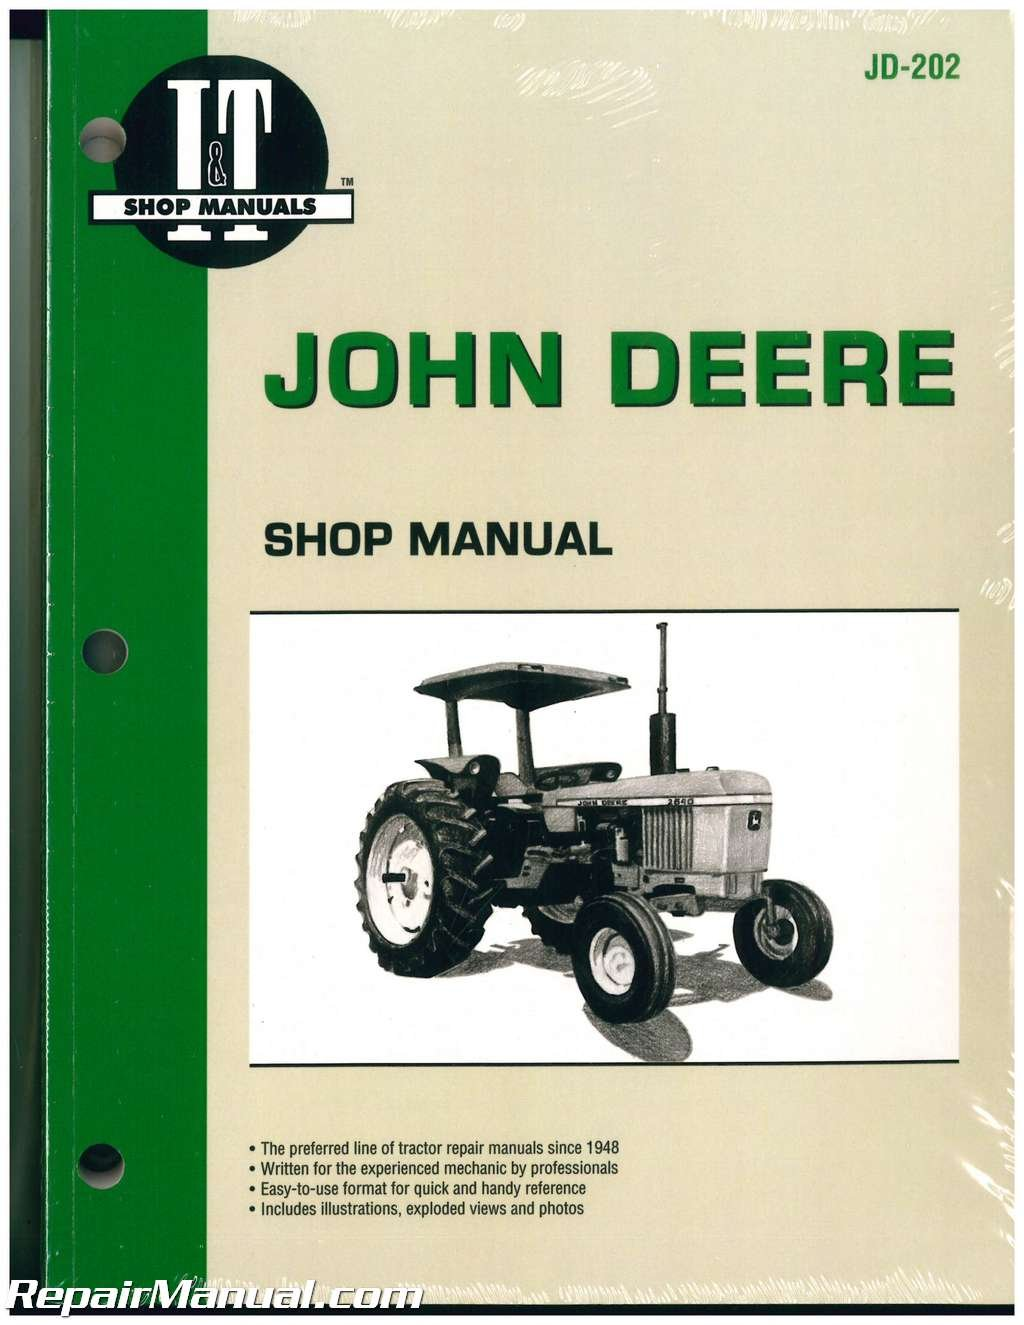 JD-202 John Deere Tractor Manual 2040 2510 2520 2240 2440 2630 2640 4040  4240 4440 4640 4840: Manufacturer: Amazon.com: Books